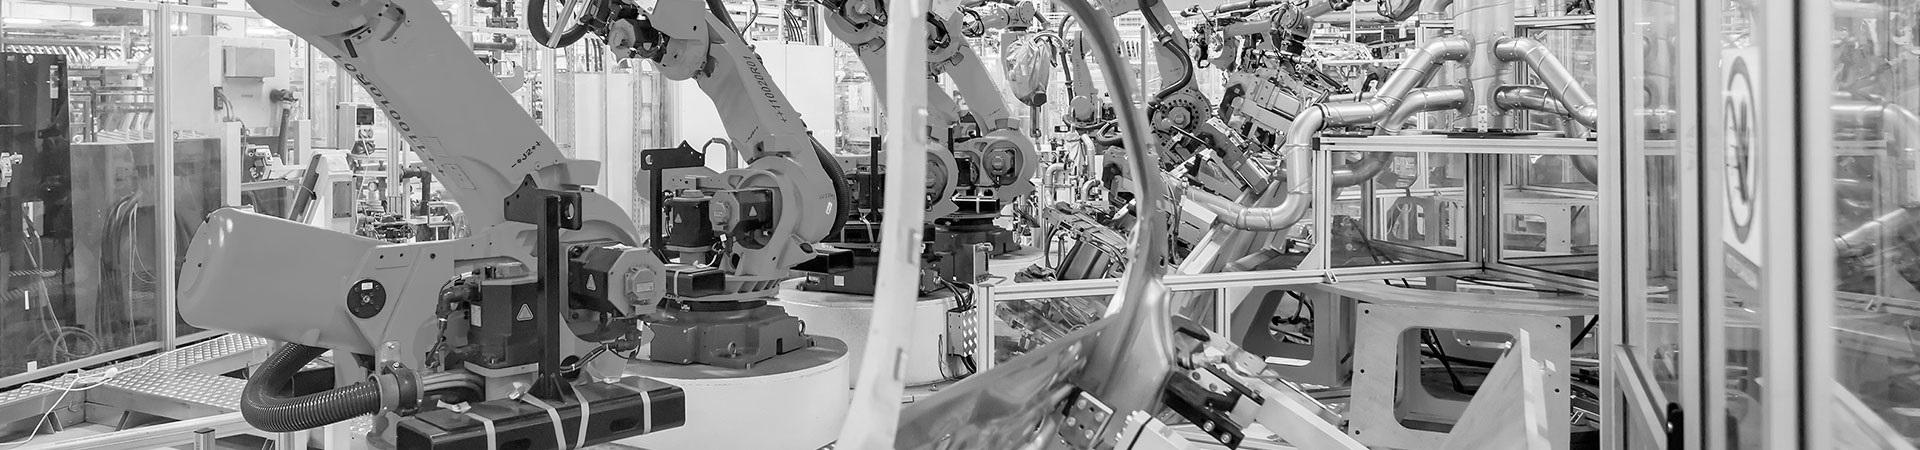 Banner de topo - X:\MARKETING - Manutenção Industrial